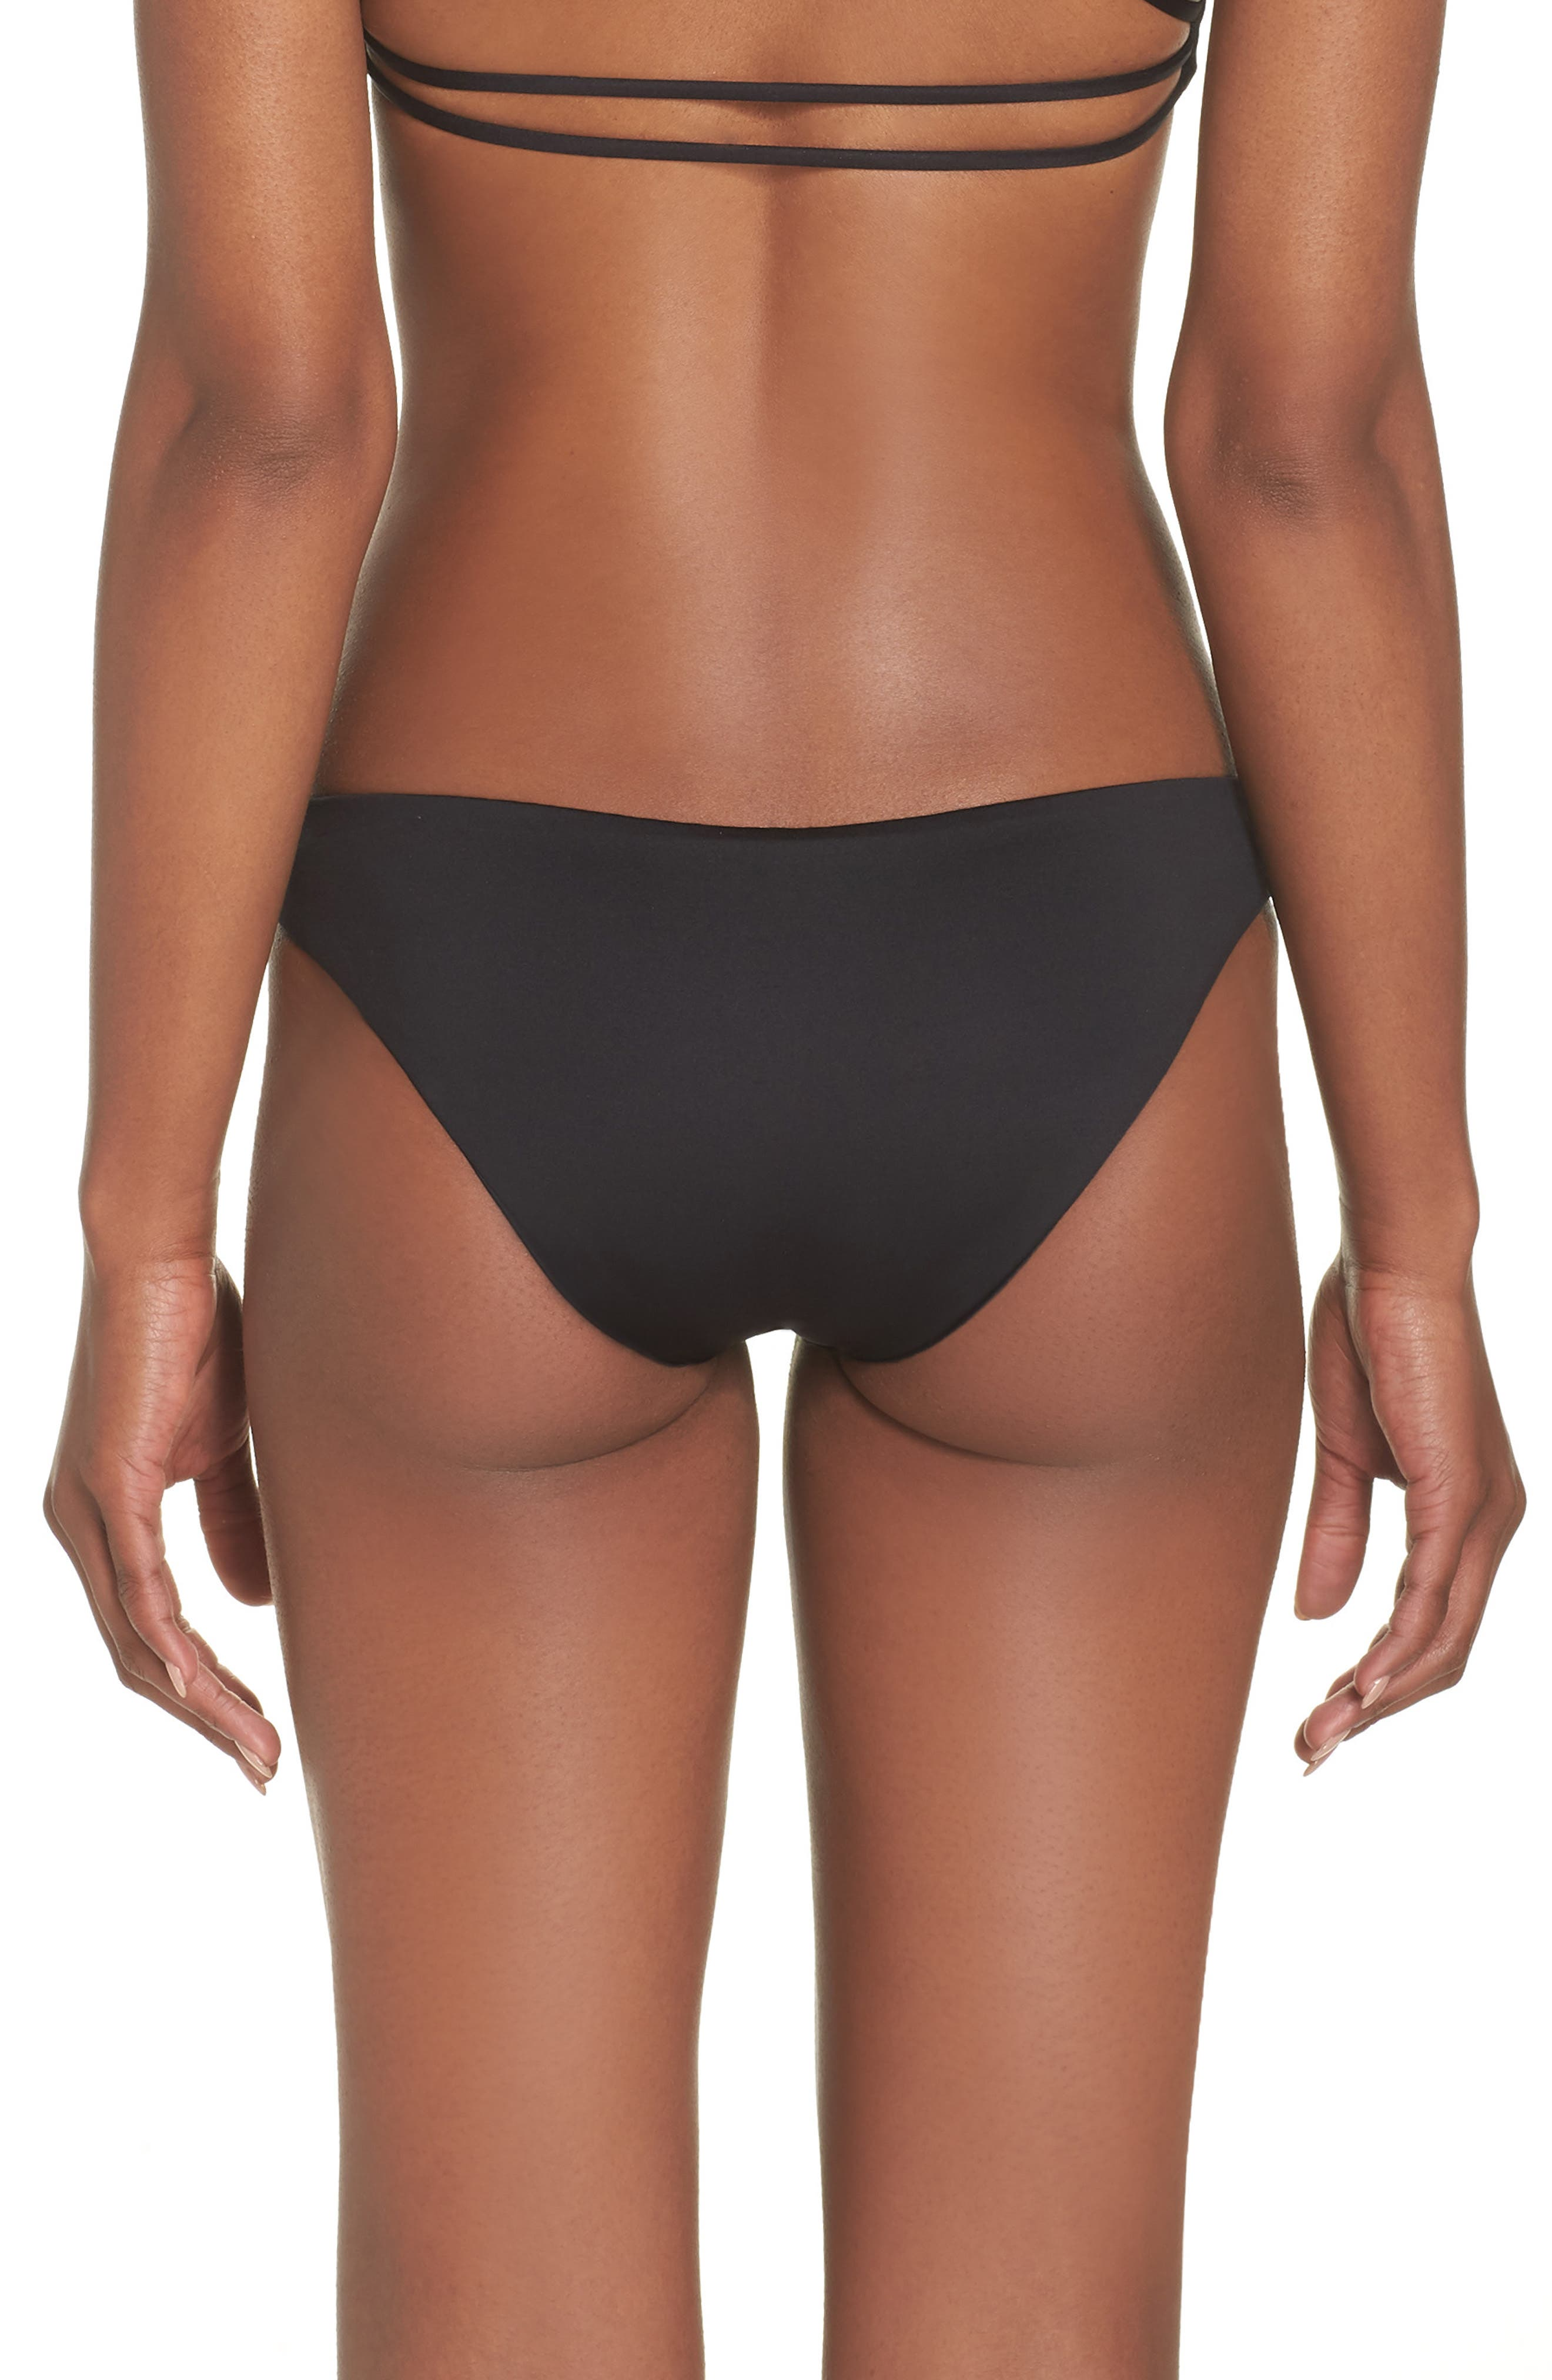 Seaglass Bay Reversible Bikini Bottoms,                             Alternate thumbnail 2, color,                             BLACK